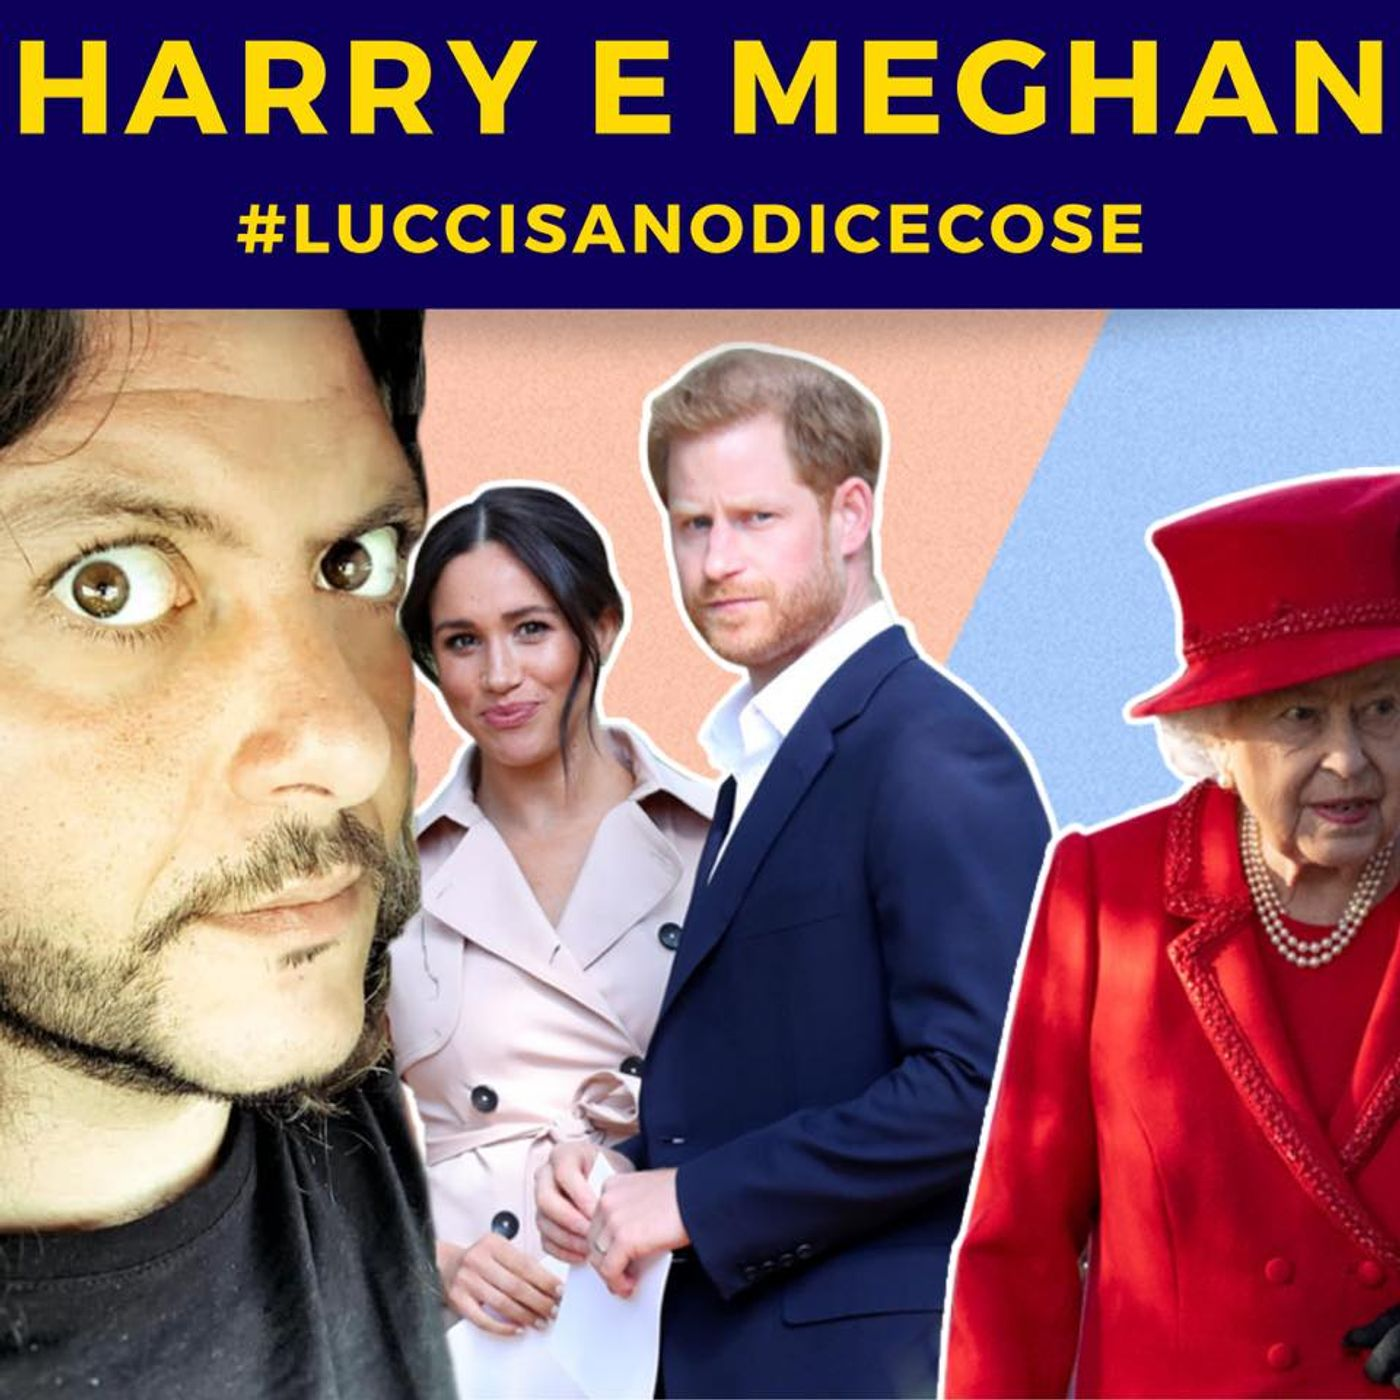 Harry e Meghan by Emiliano Luccisano